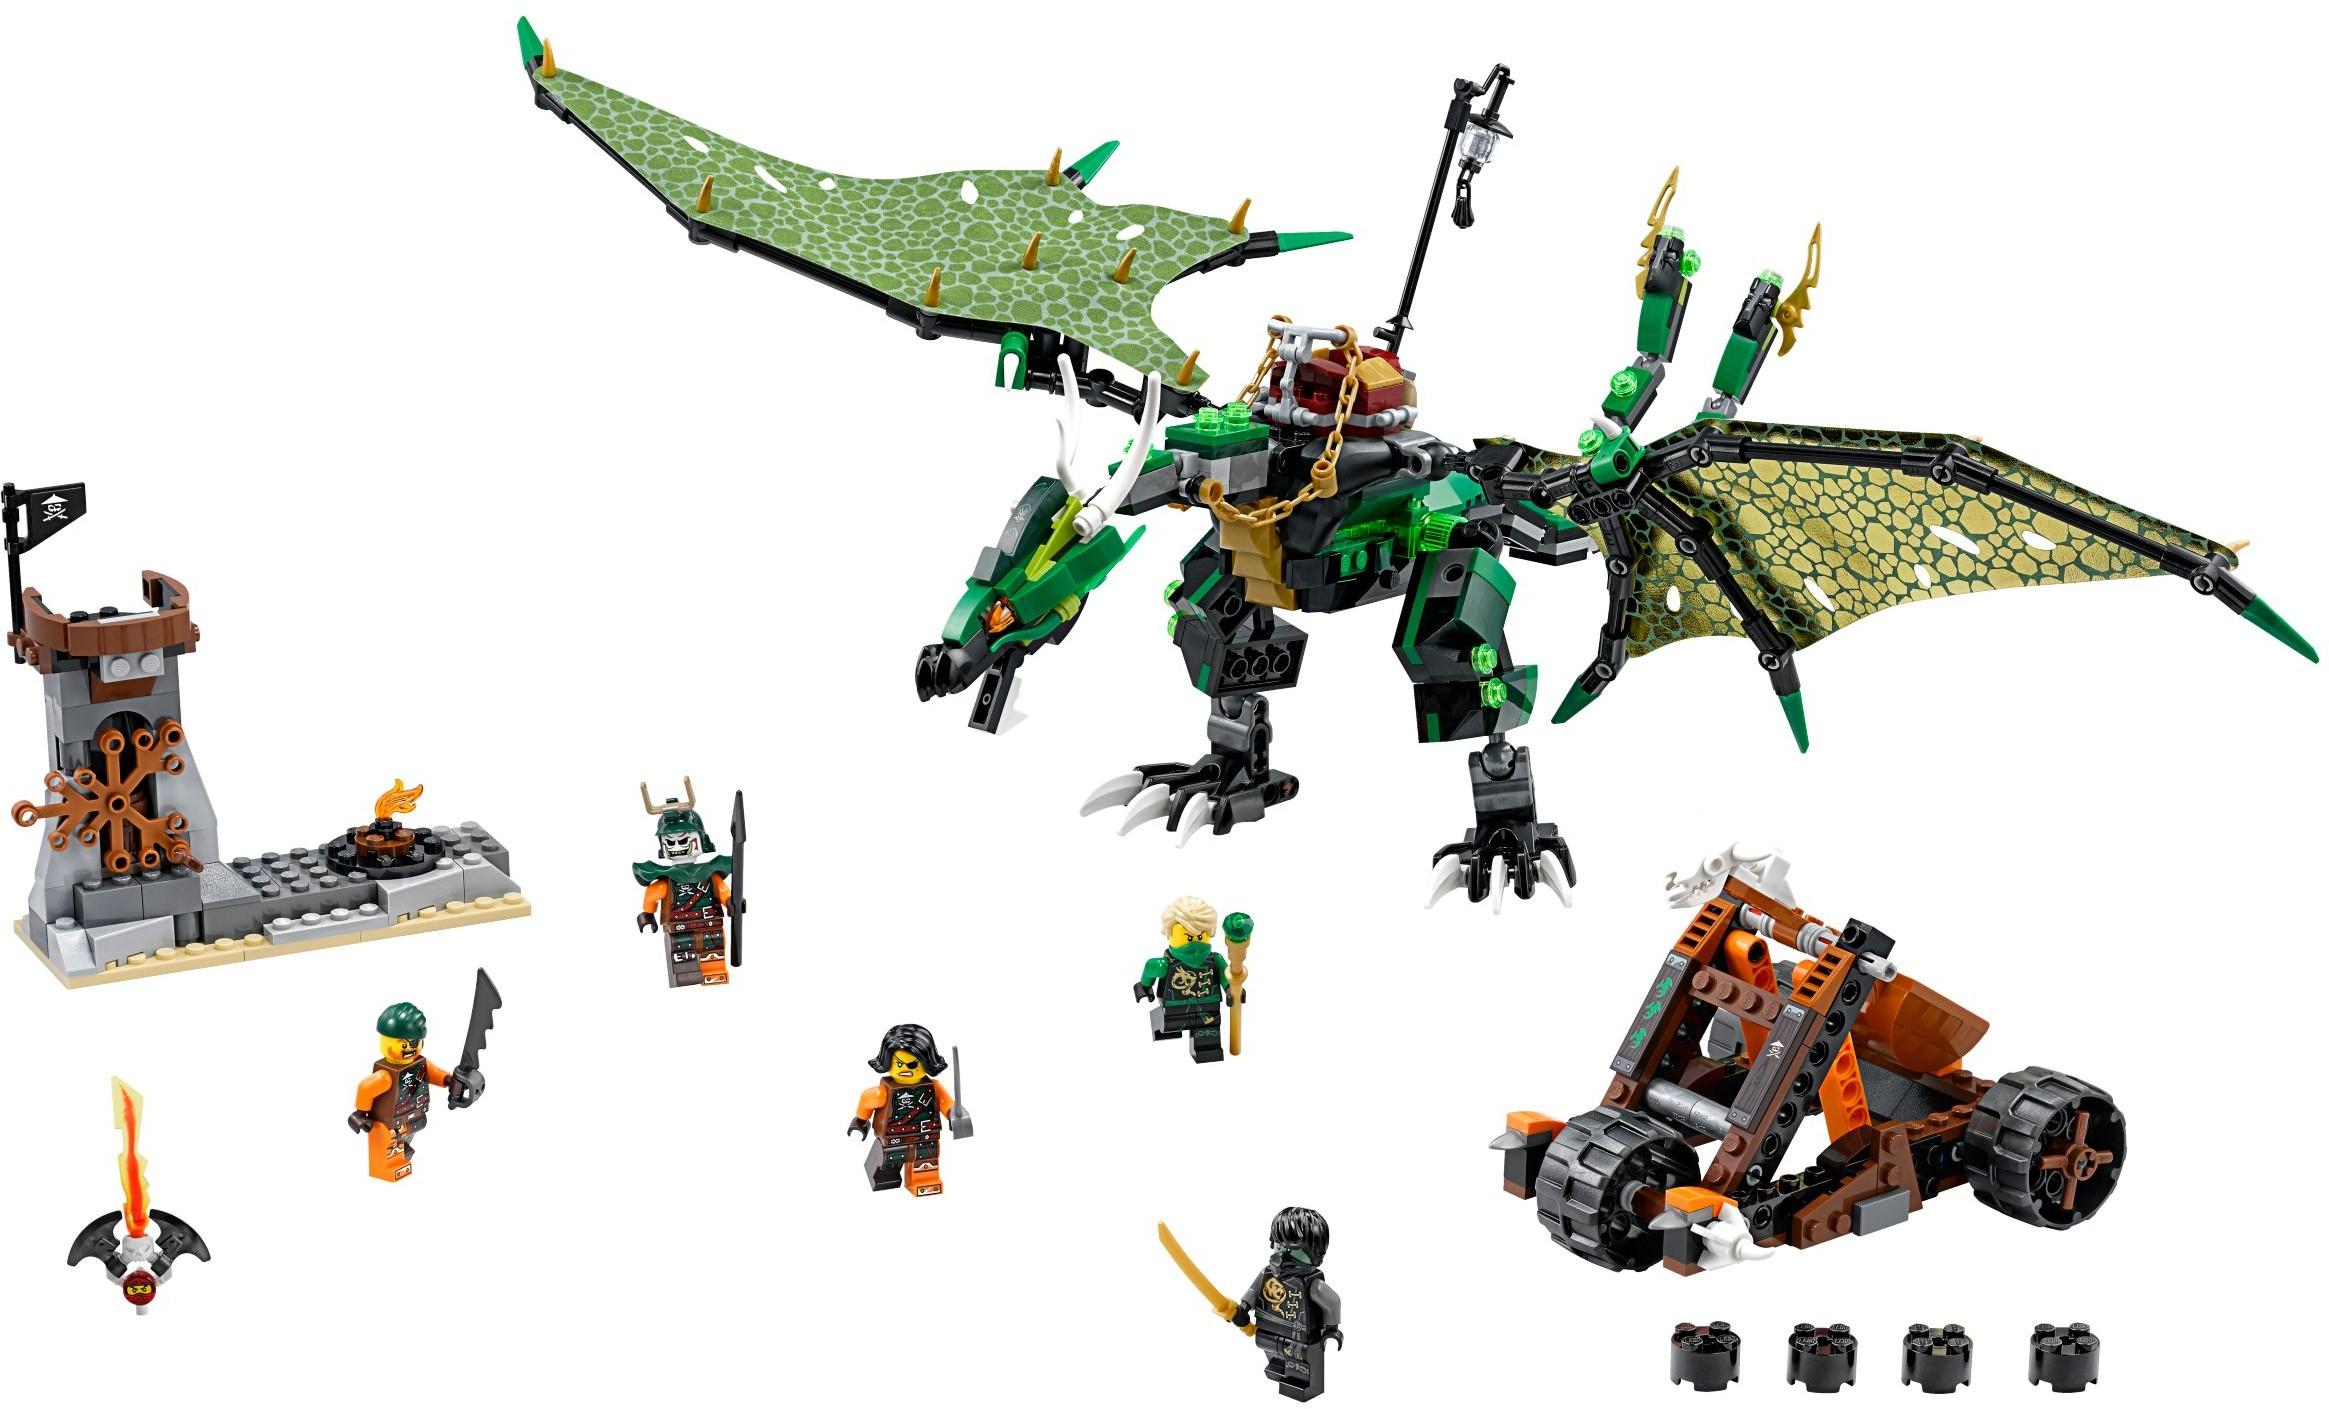 Tagged Djinn Blade Brickset Lego Set Guide And Database Ninjago 70594 The Lighthouse Siege Green Nrg Dragon